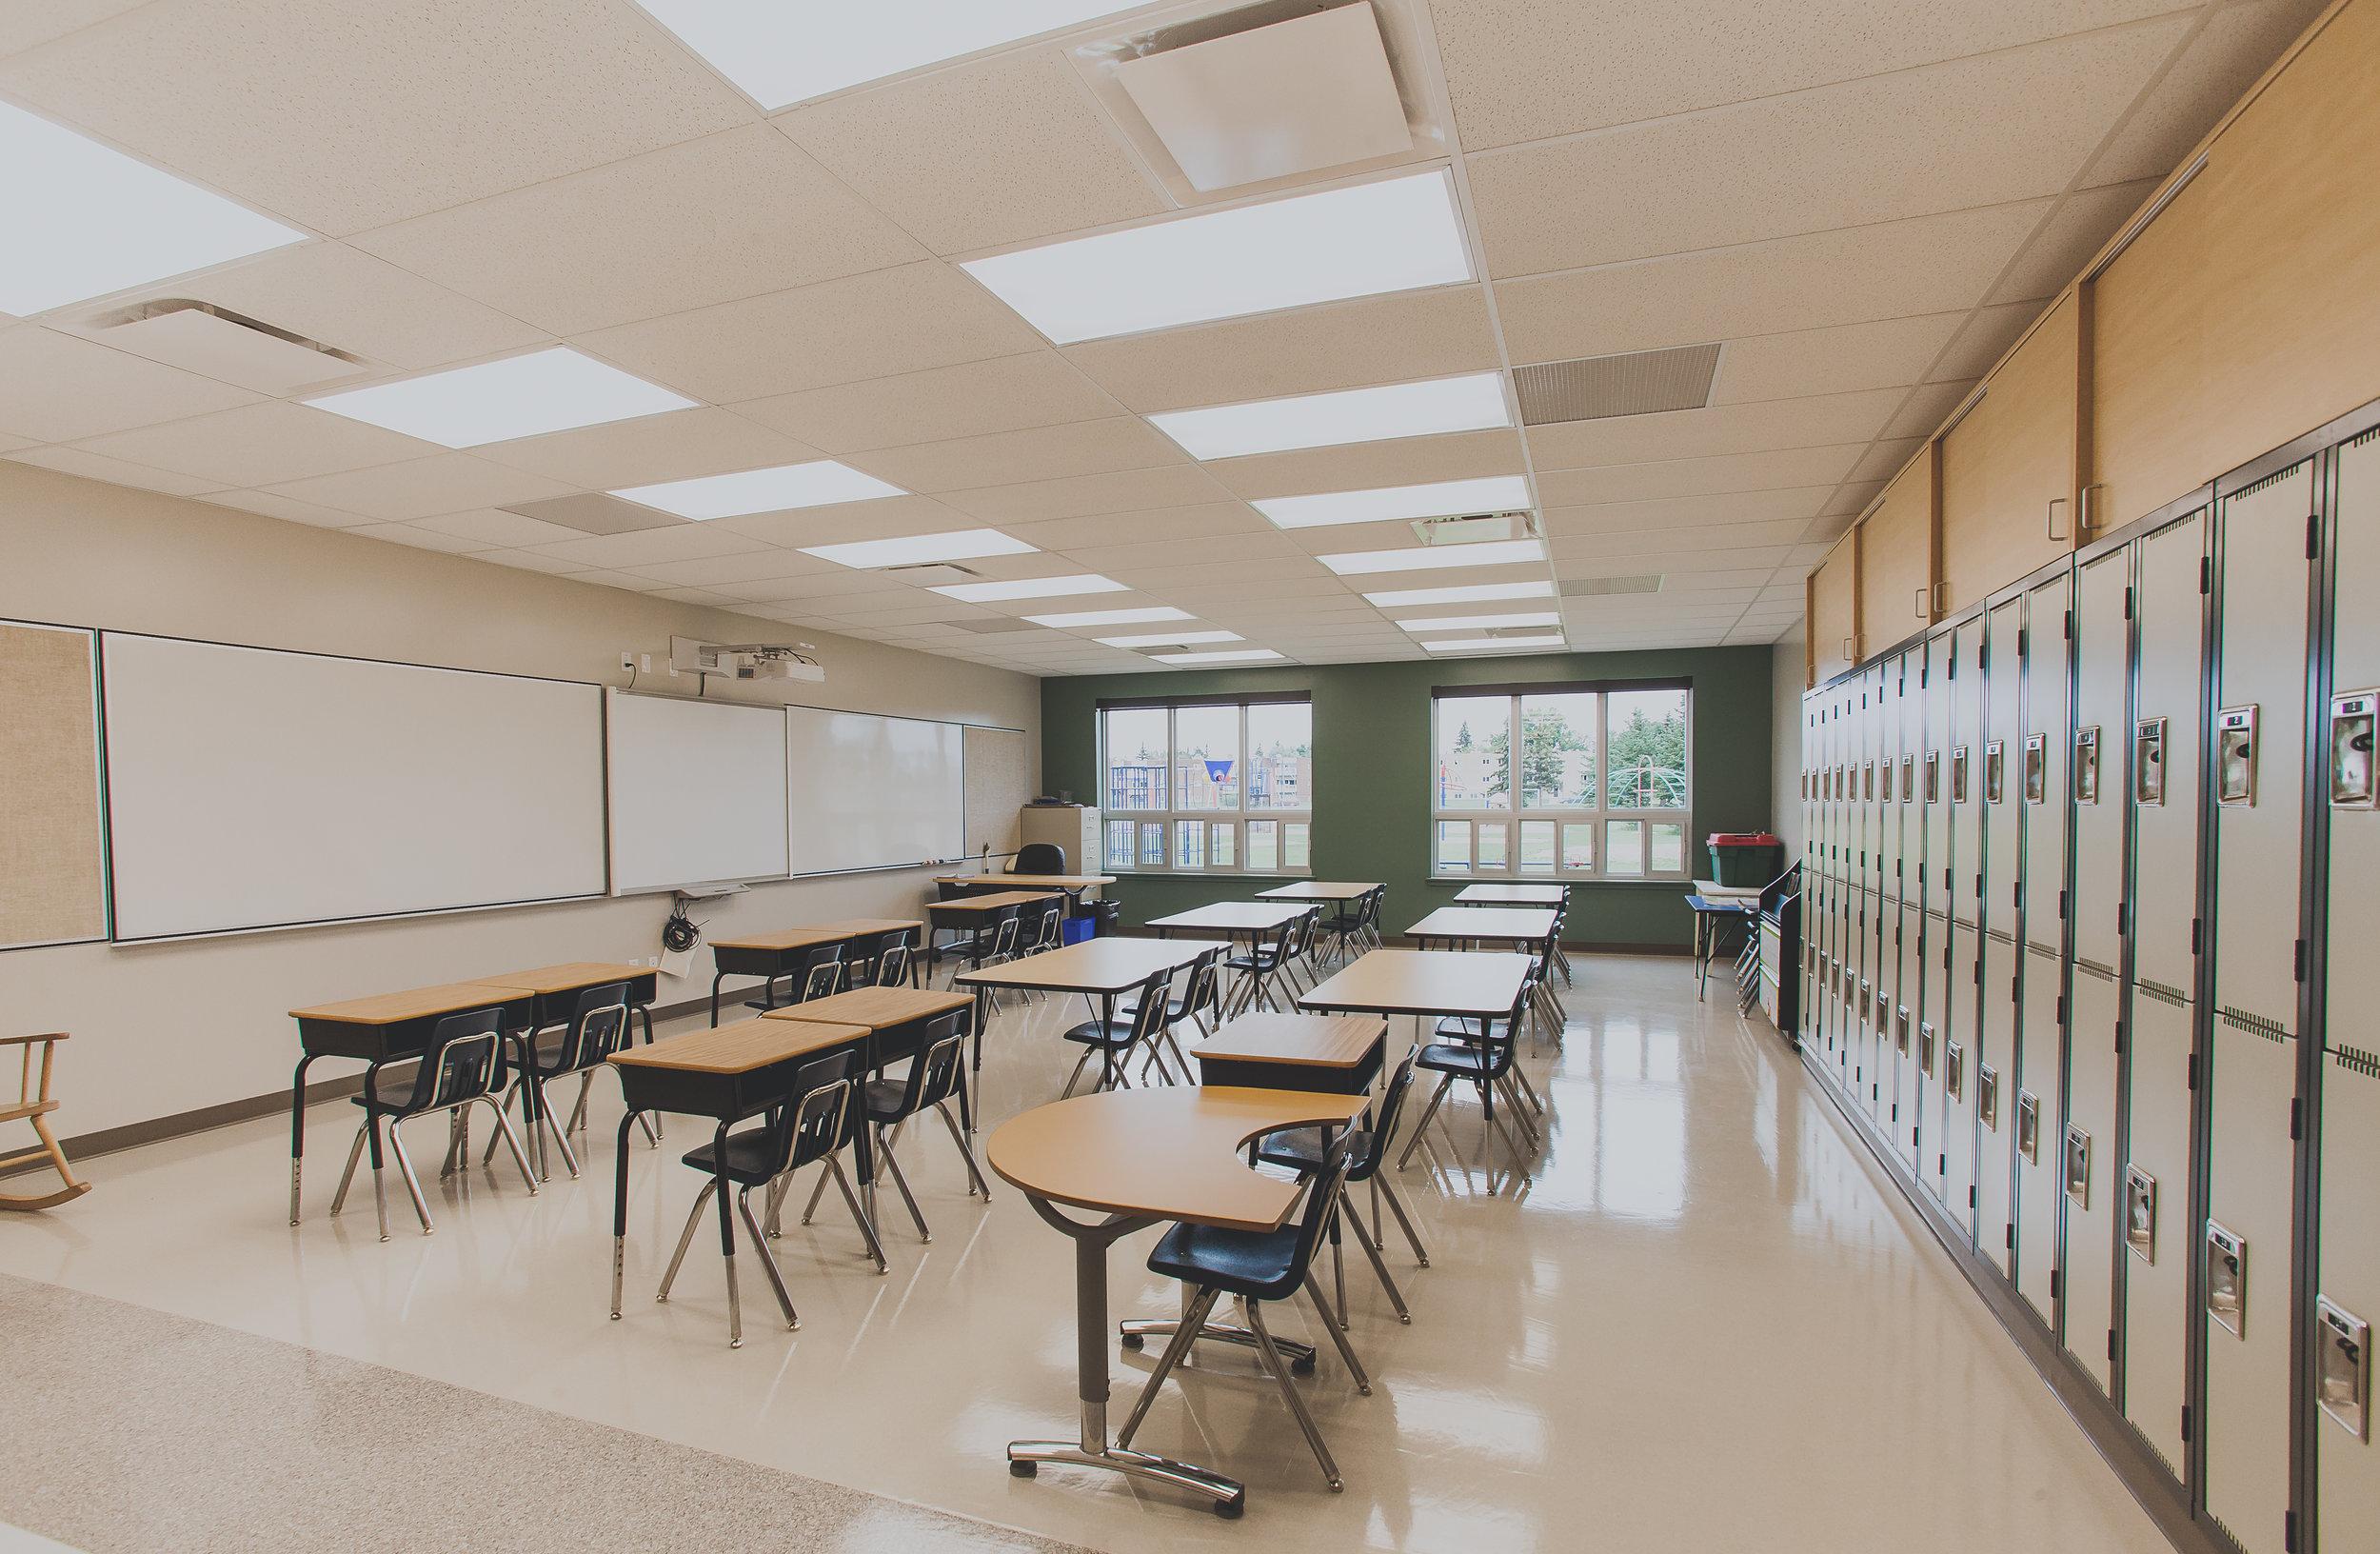 Classroom15.jpg